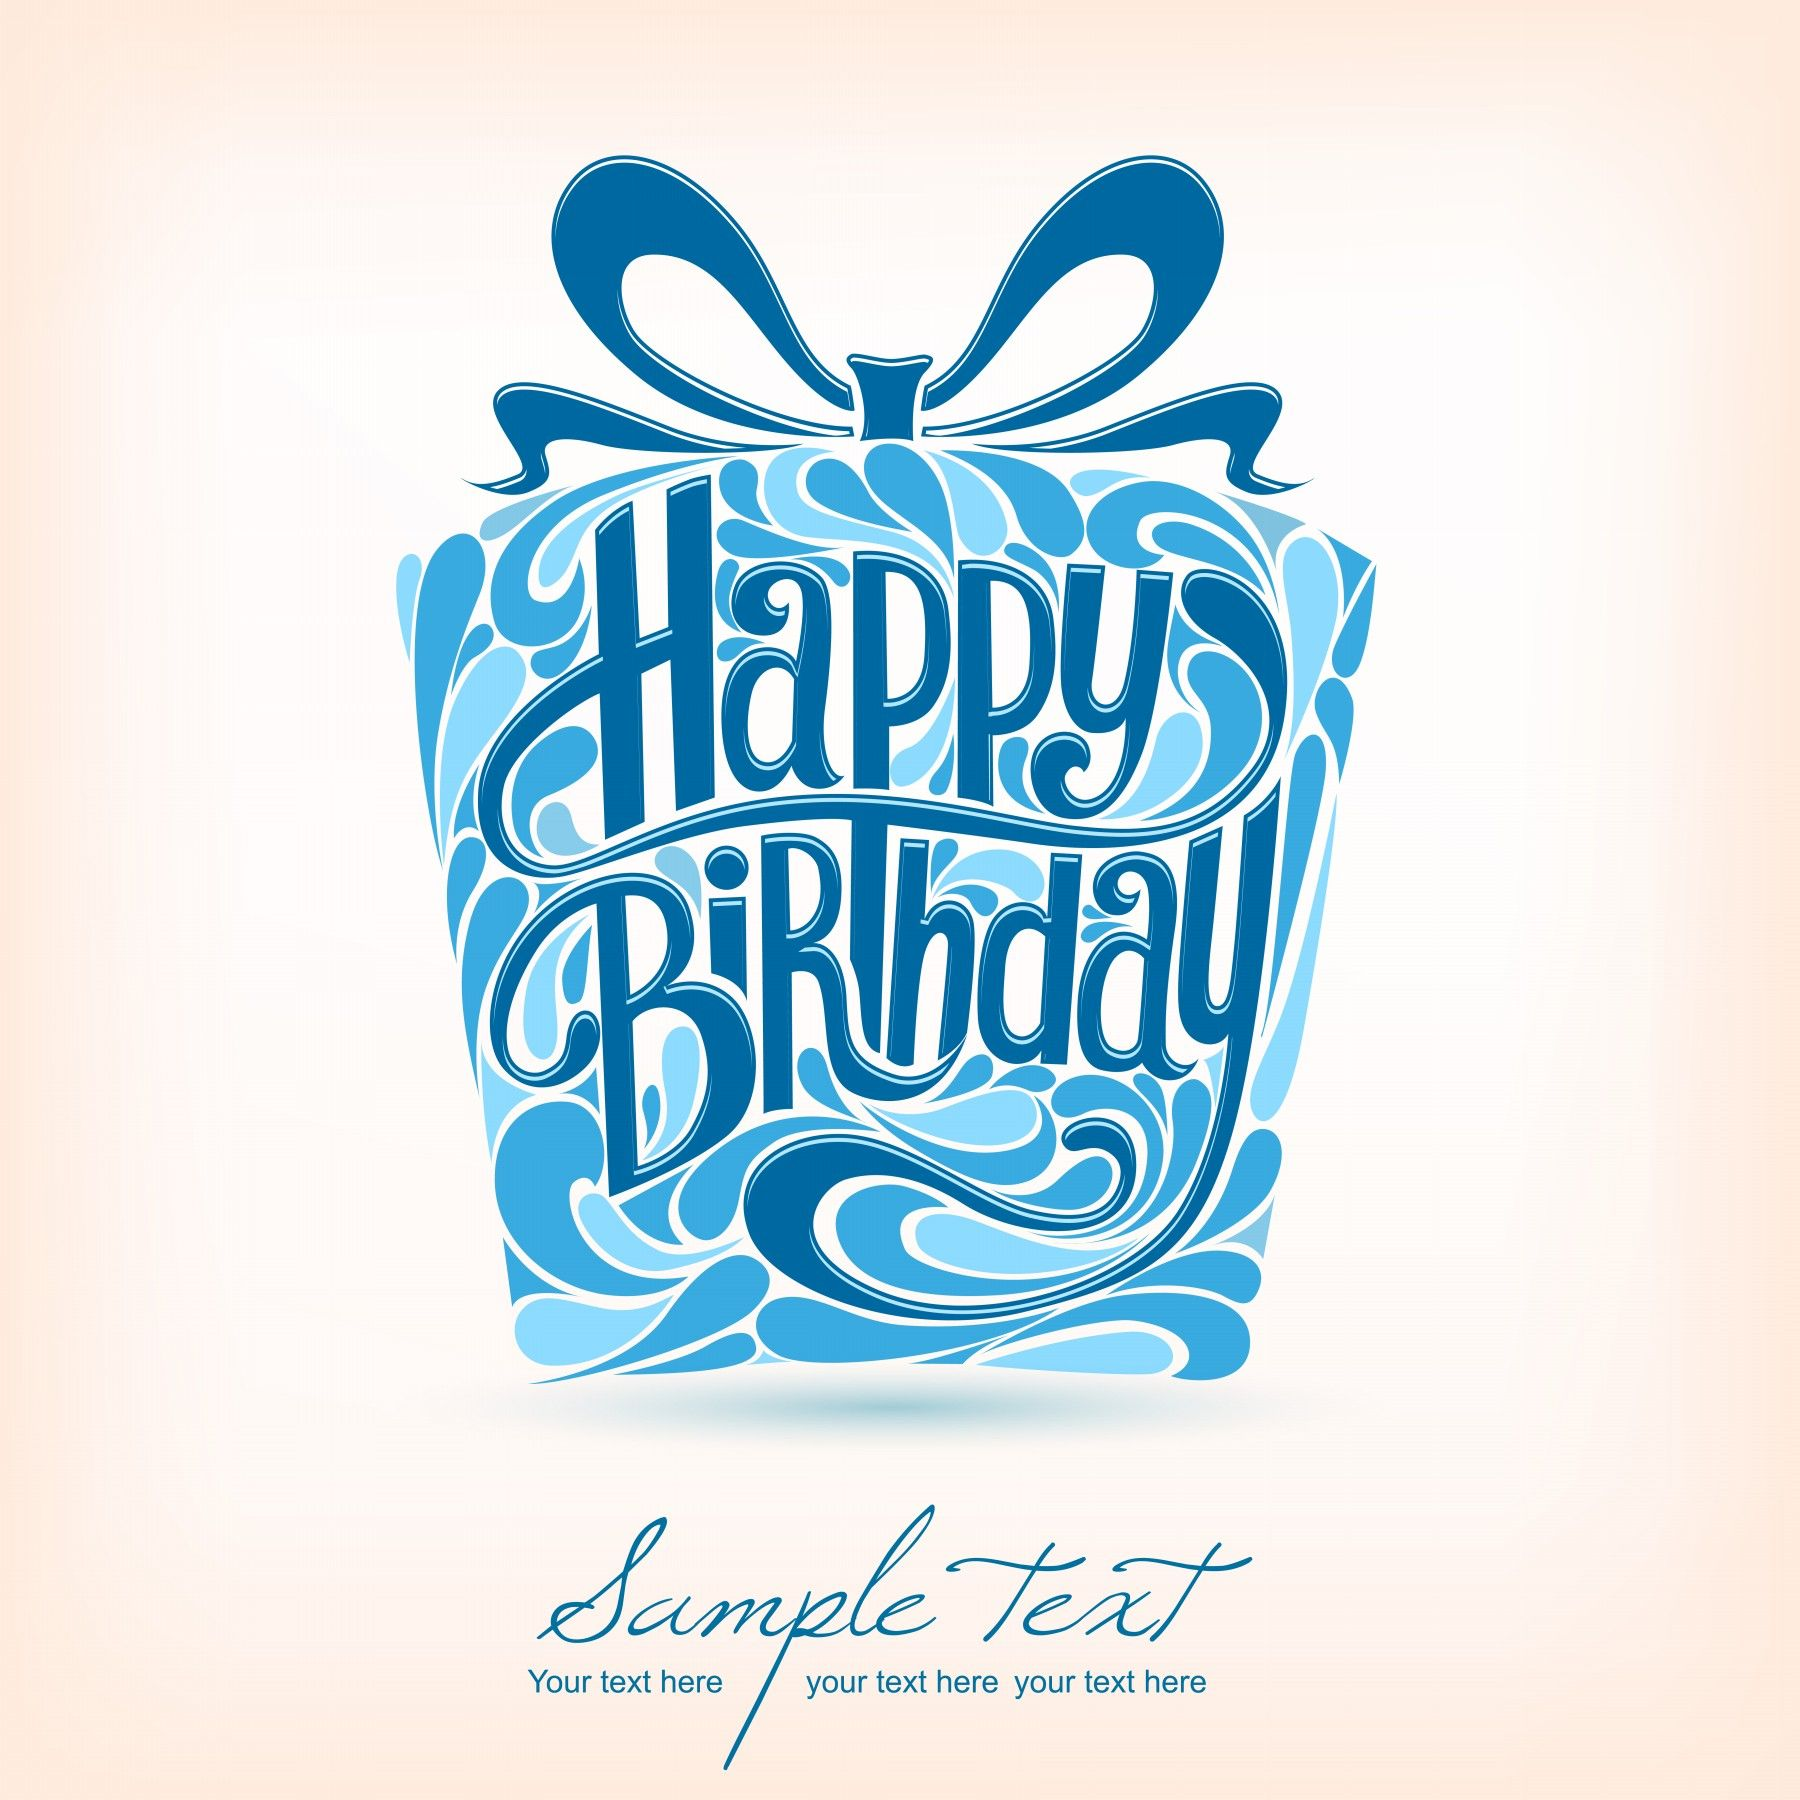 Happy Birthday Blue Font Birthday Card Design Art